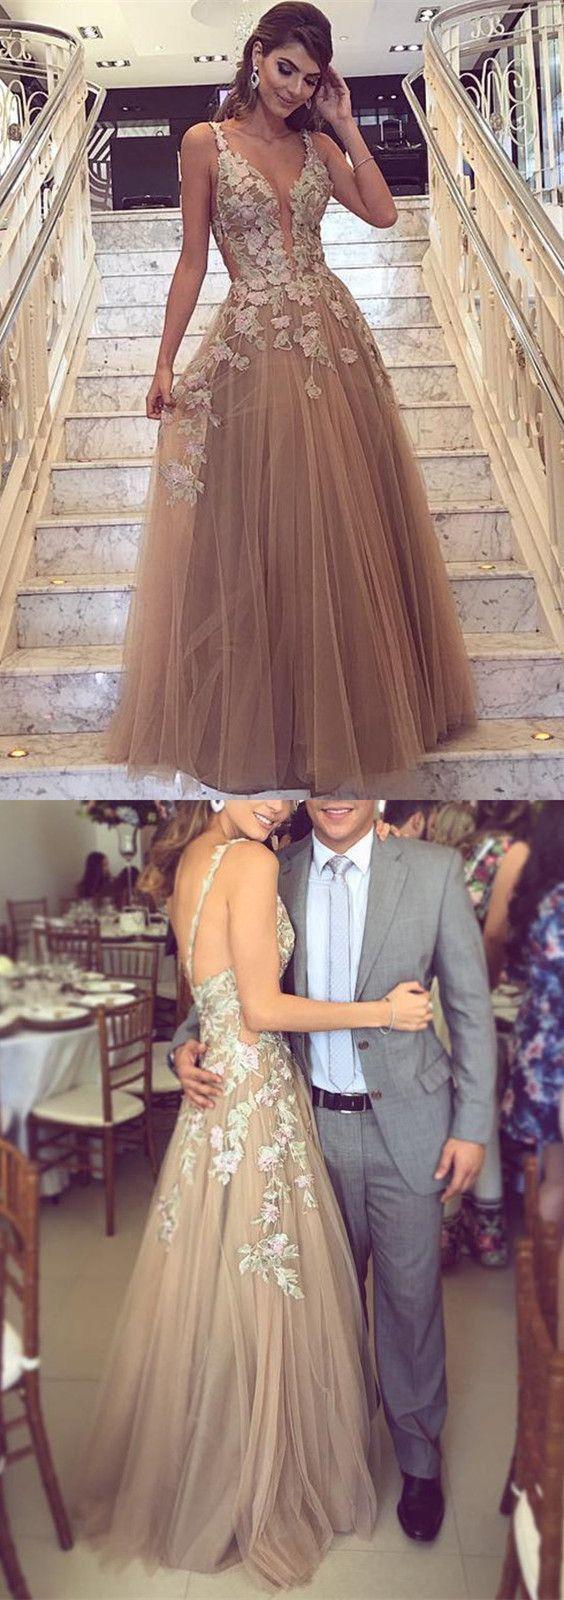 Champagne v neck floor length lace long prom dresses champagne